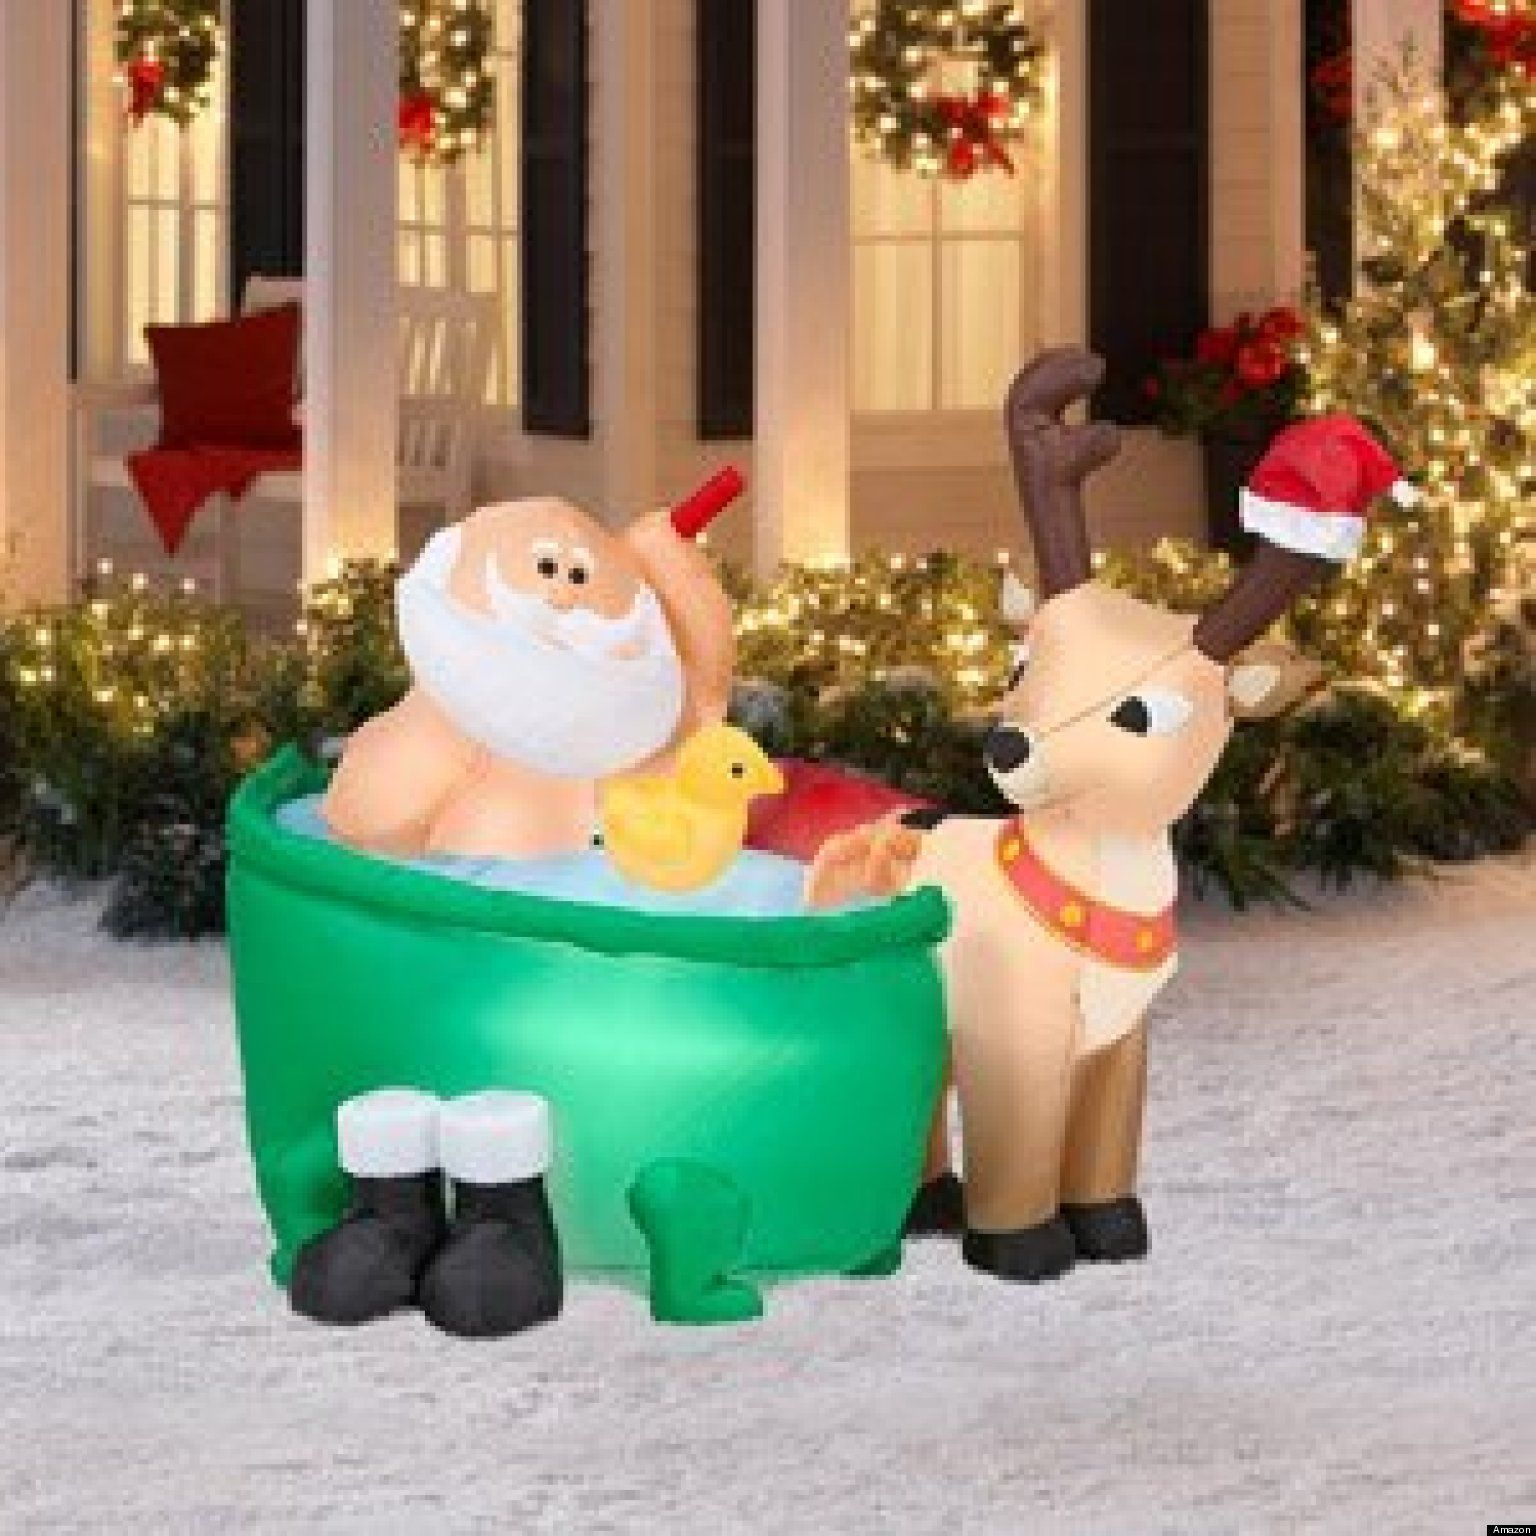 Gemmy inflatable airblown reindeer outdoor christmas decoration lowe - Christmas Worst Inflatable Christmas Decorations Photos Christmas Outdoor Snow Icereindeer